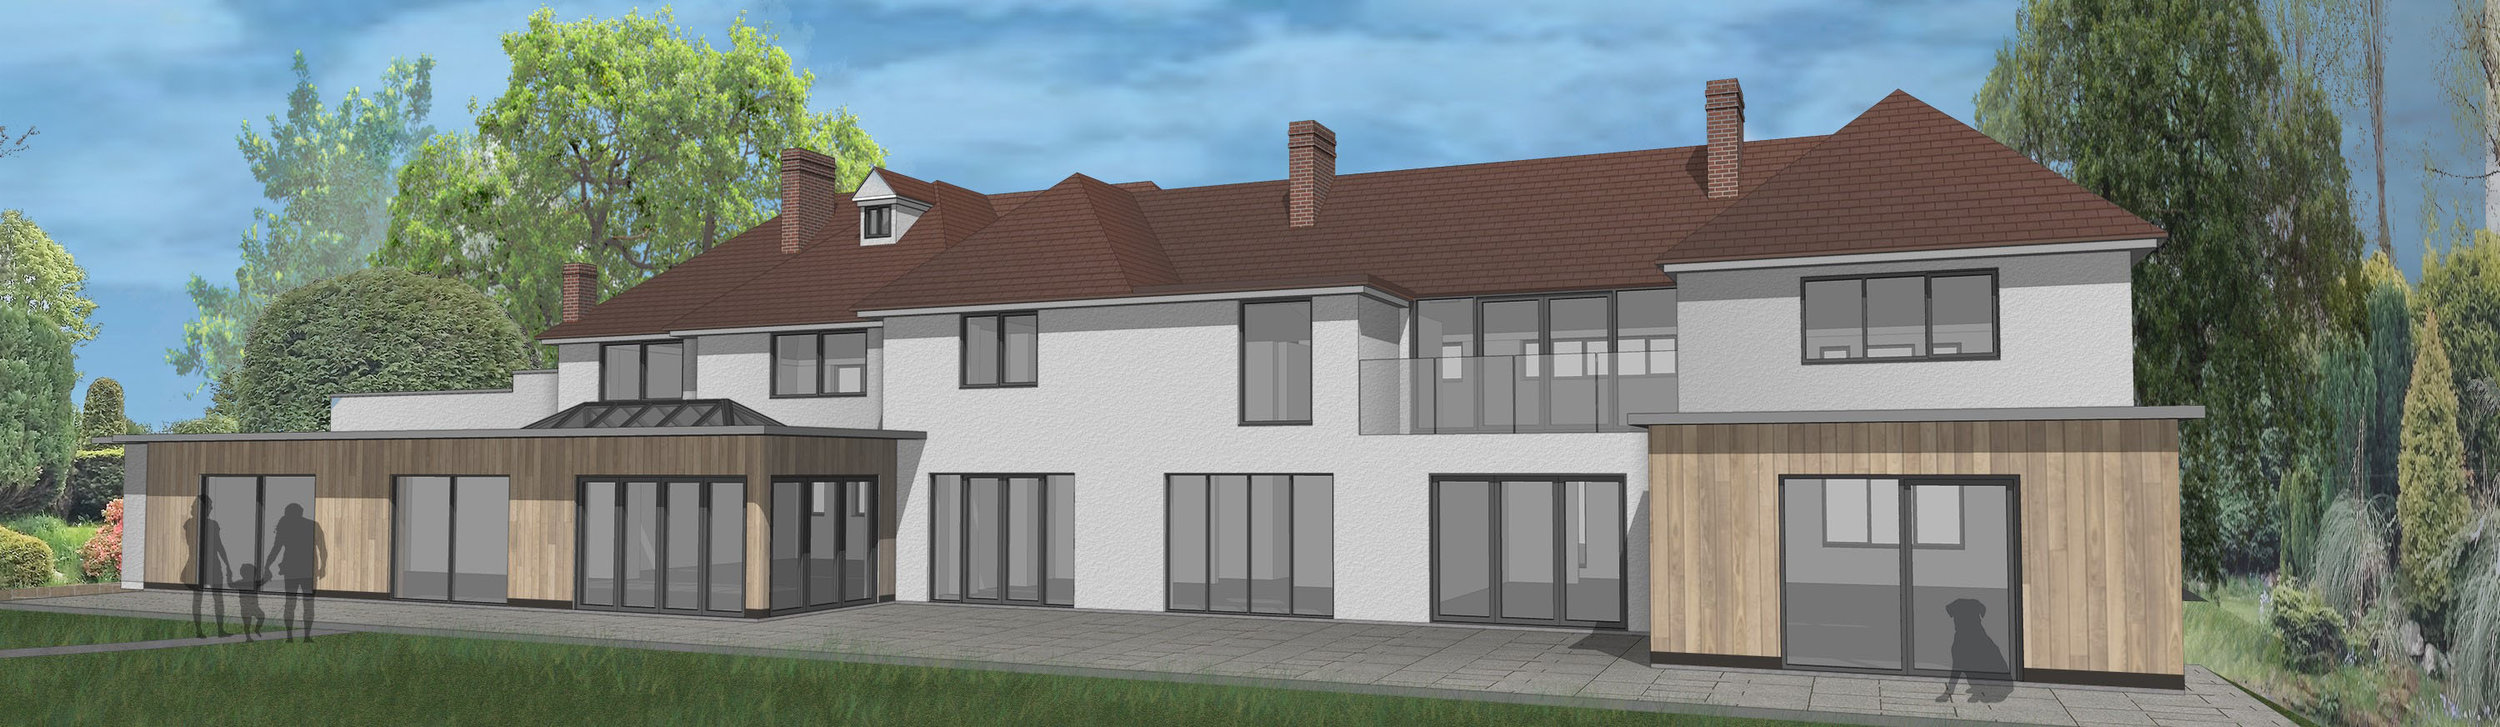 Batley-residence